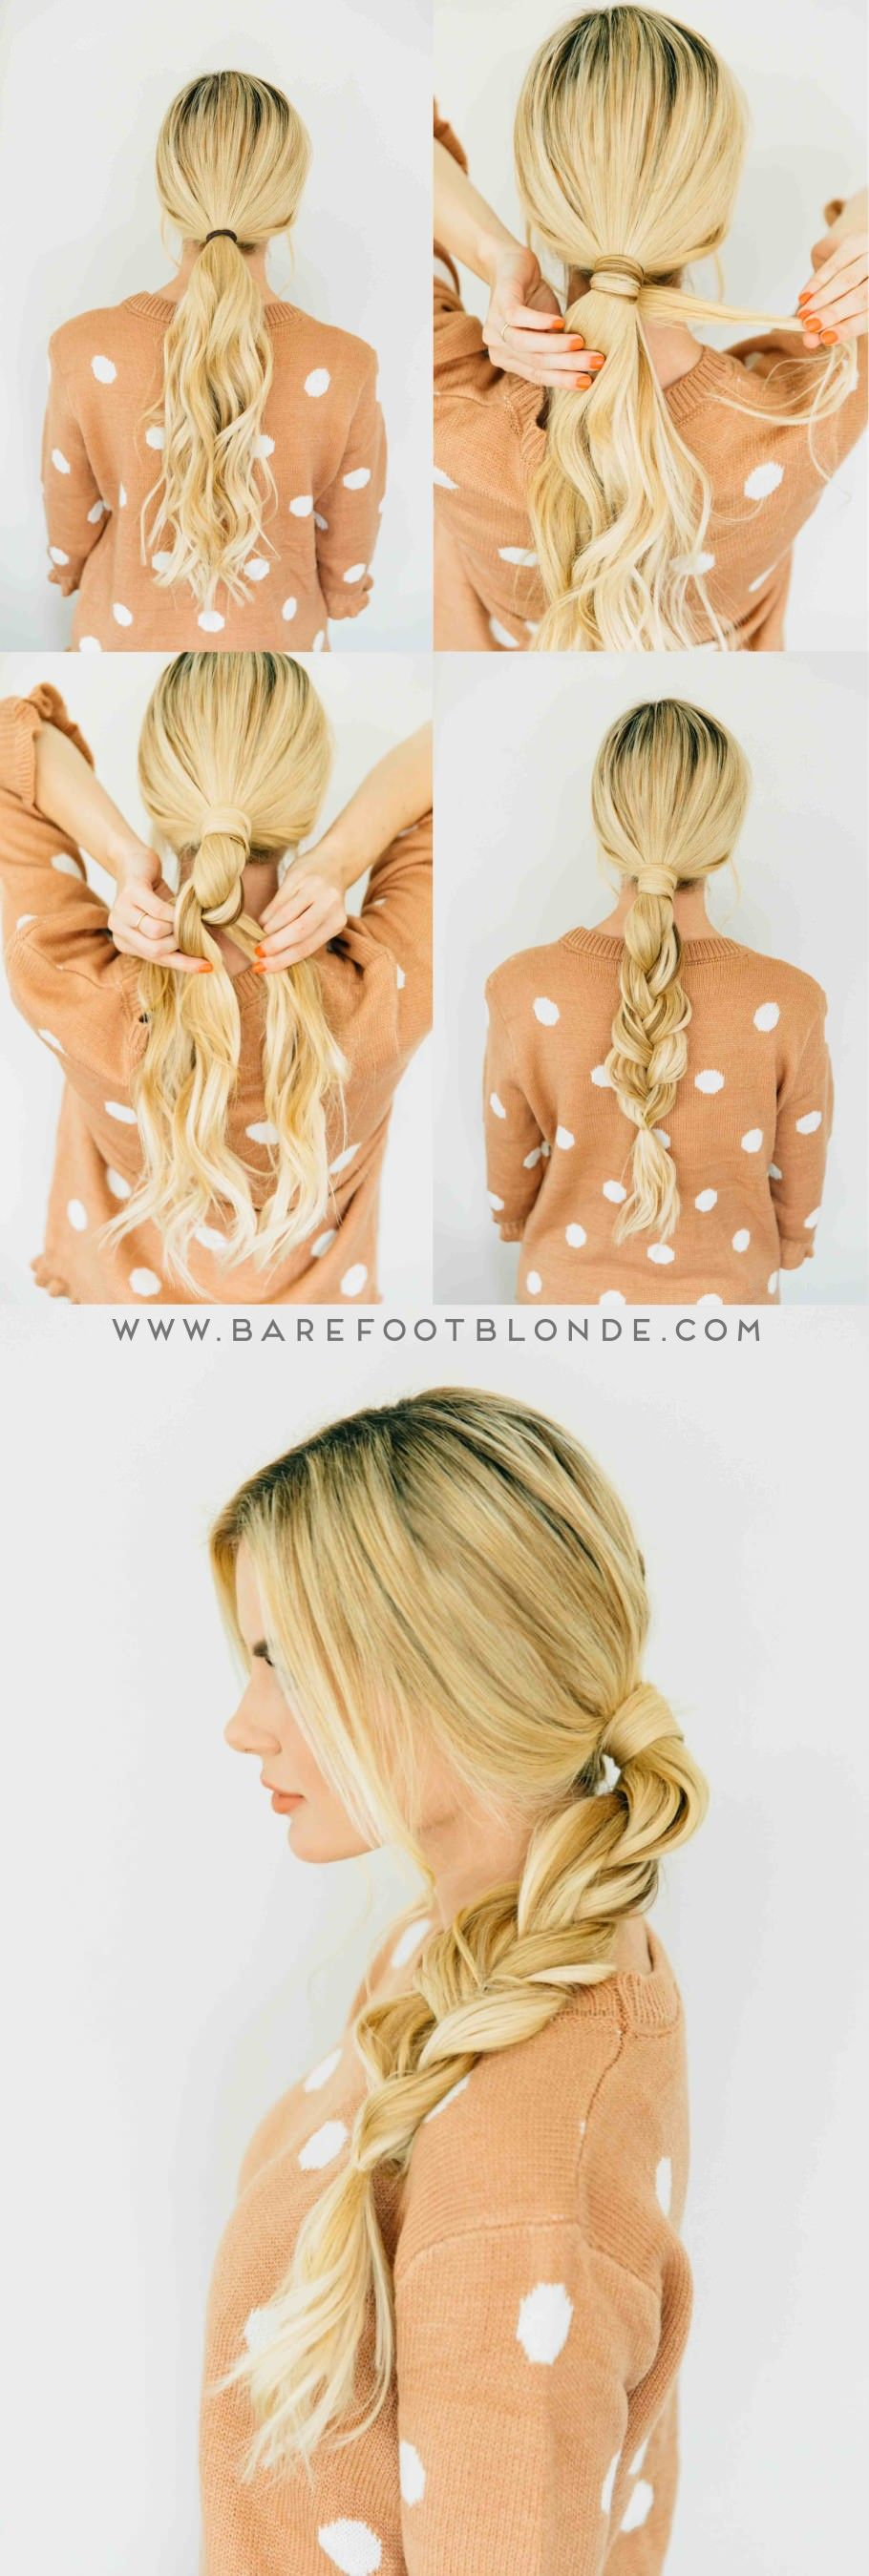 hairthree-1